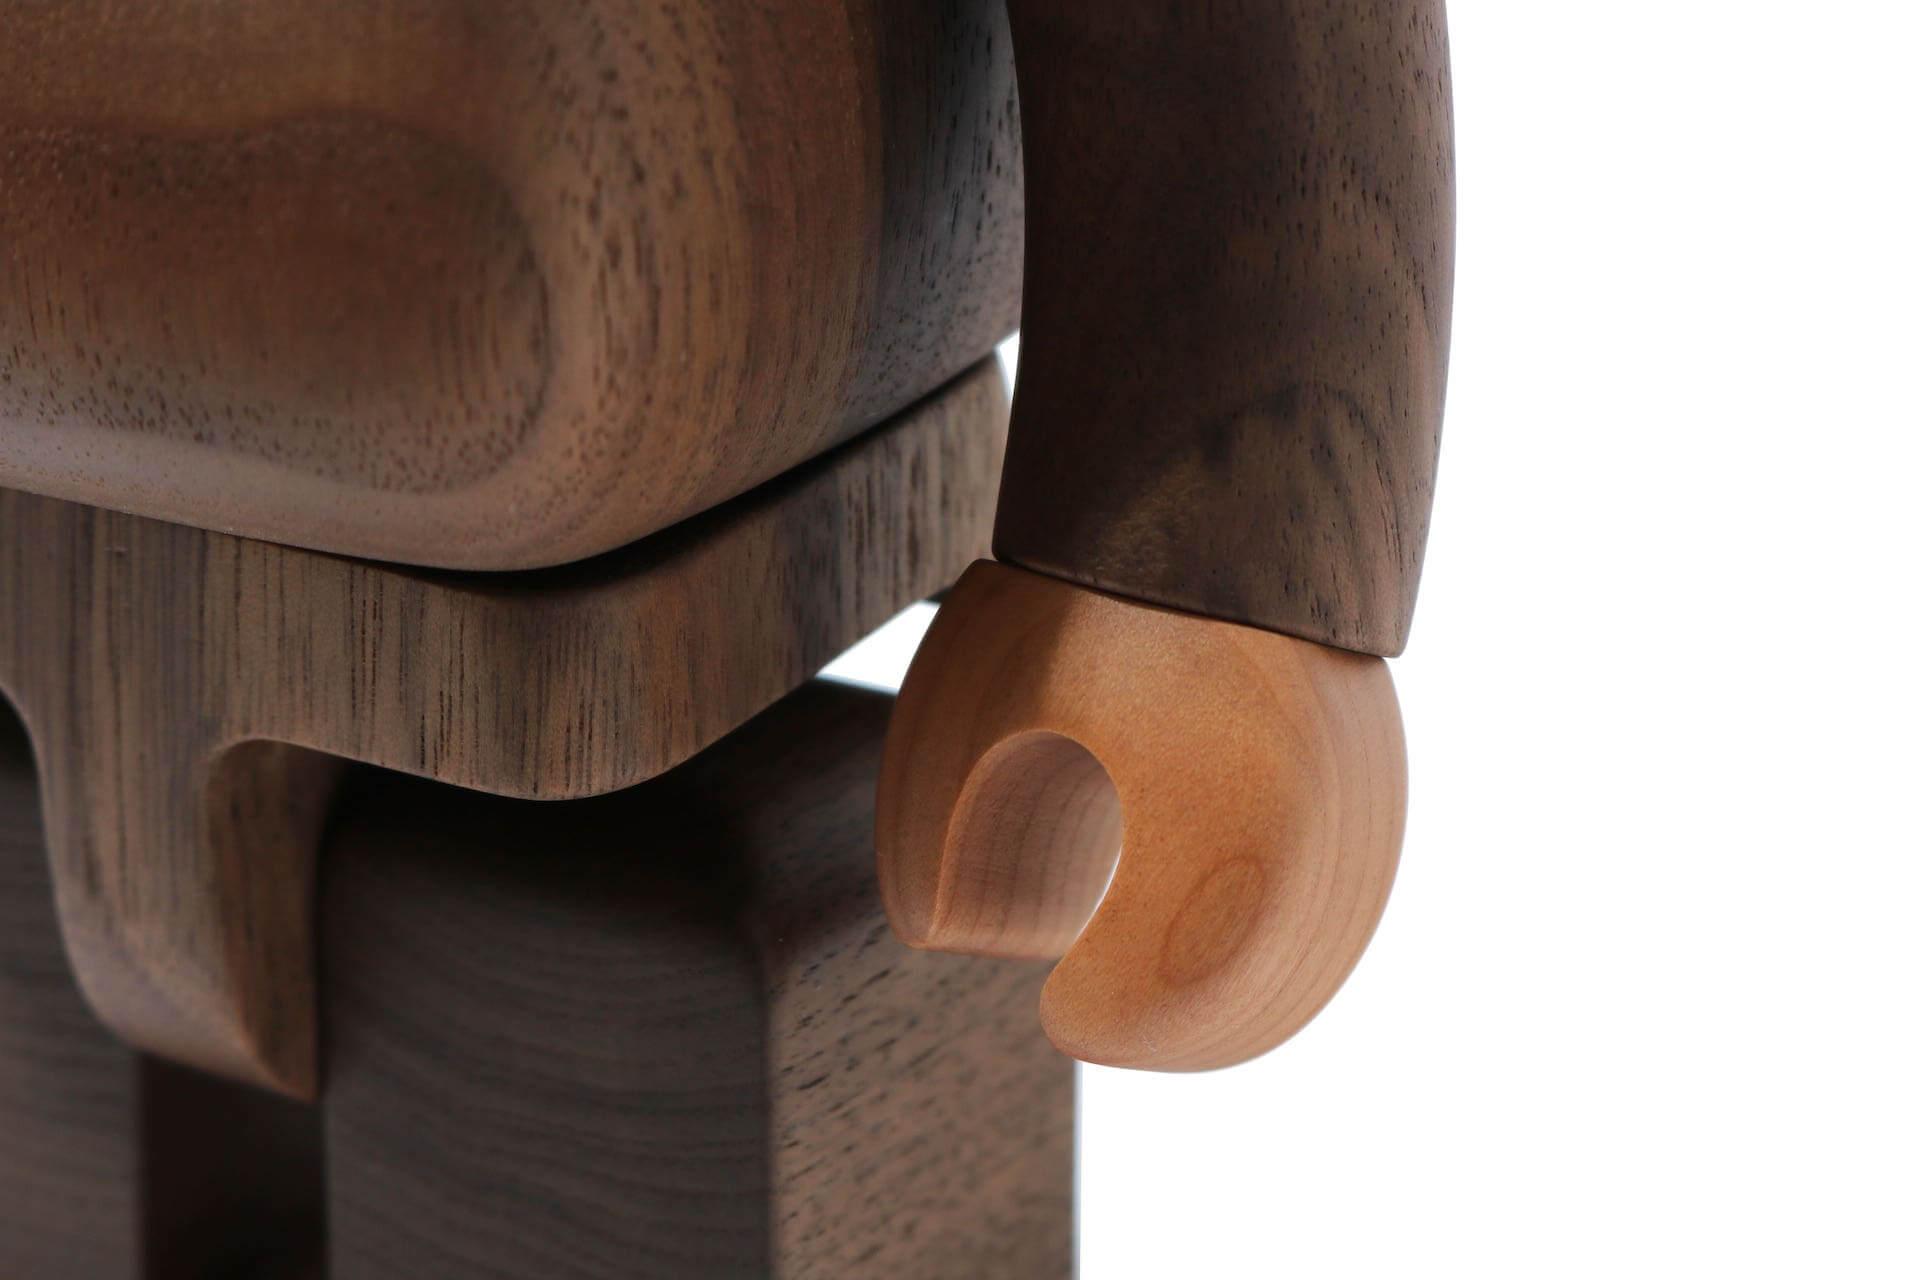 A BATHING APE(R)×カリモク×メディコム・トイのトリプルコラボ!BABY MILO(R)の木製BE@RBRICKが登場 ac200526_bearbrick_07